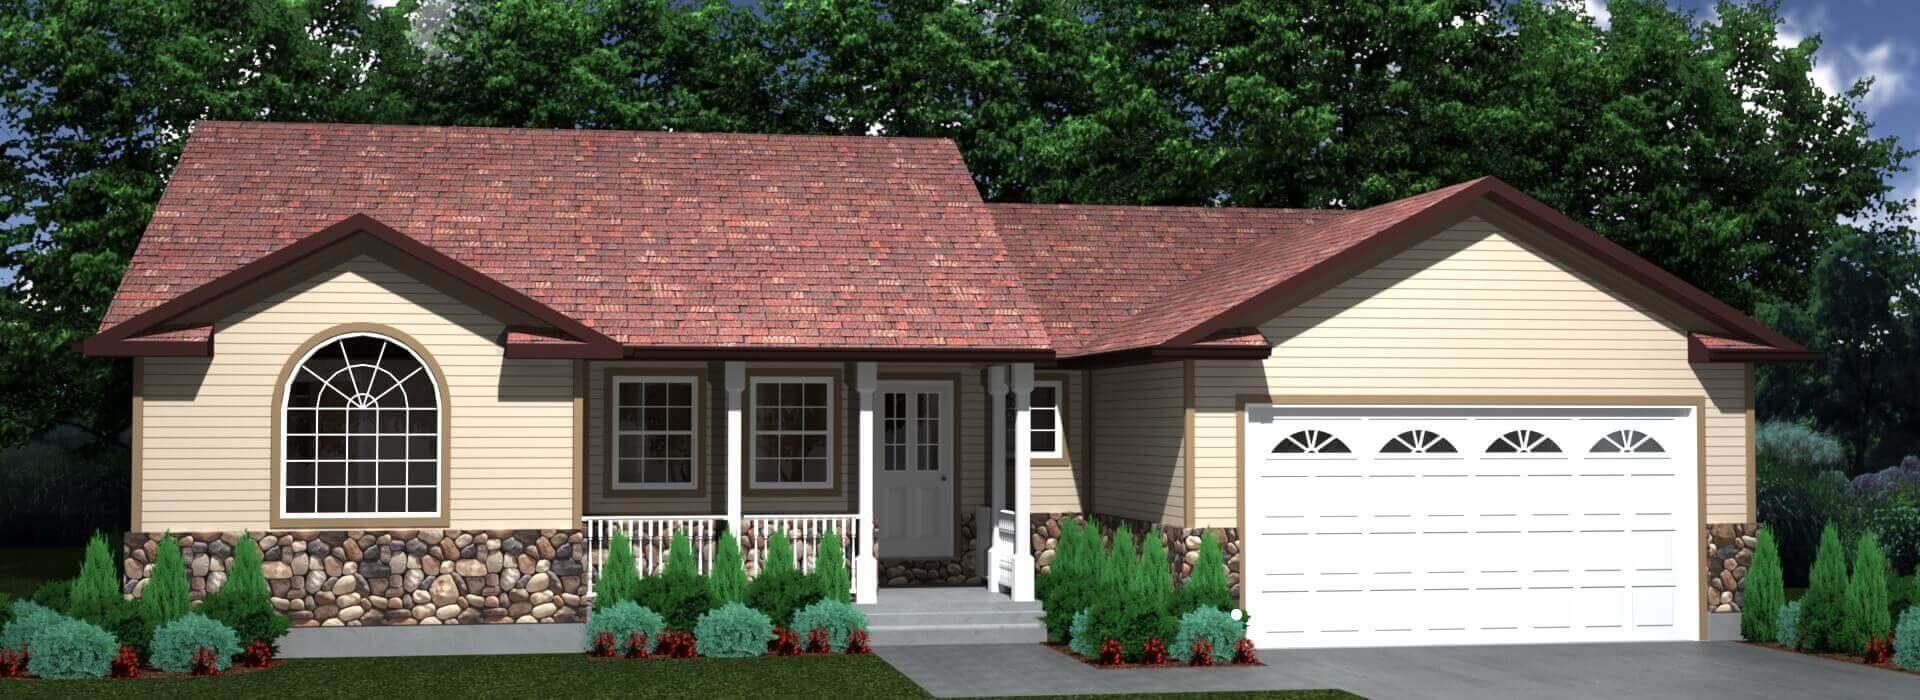 1454 house elevation